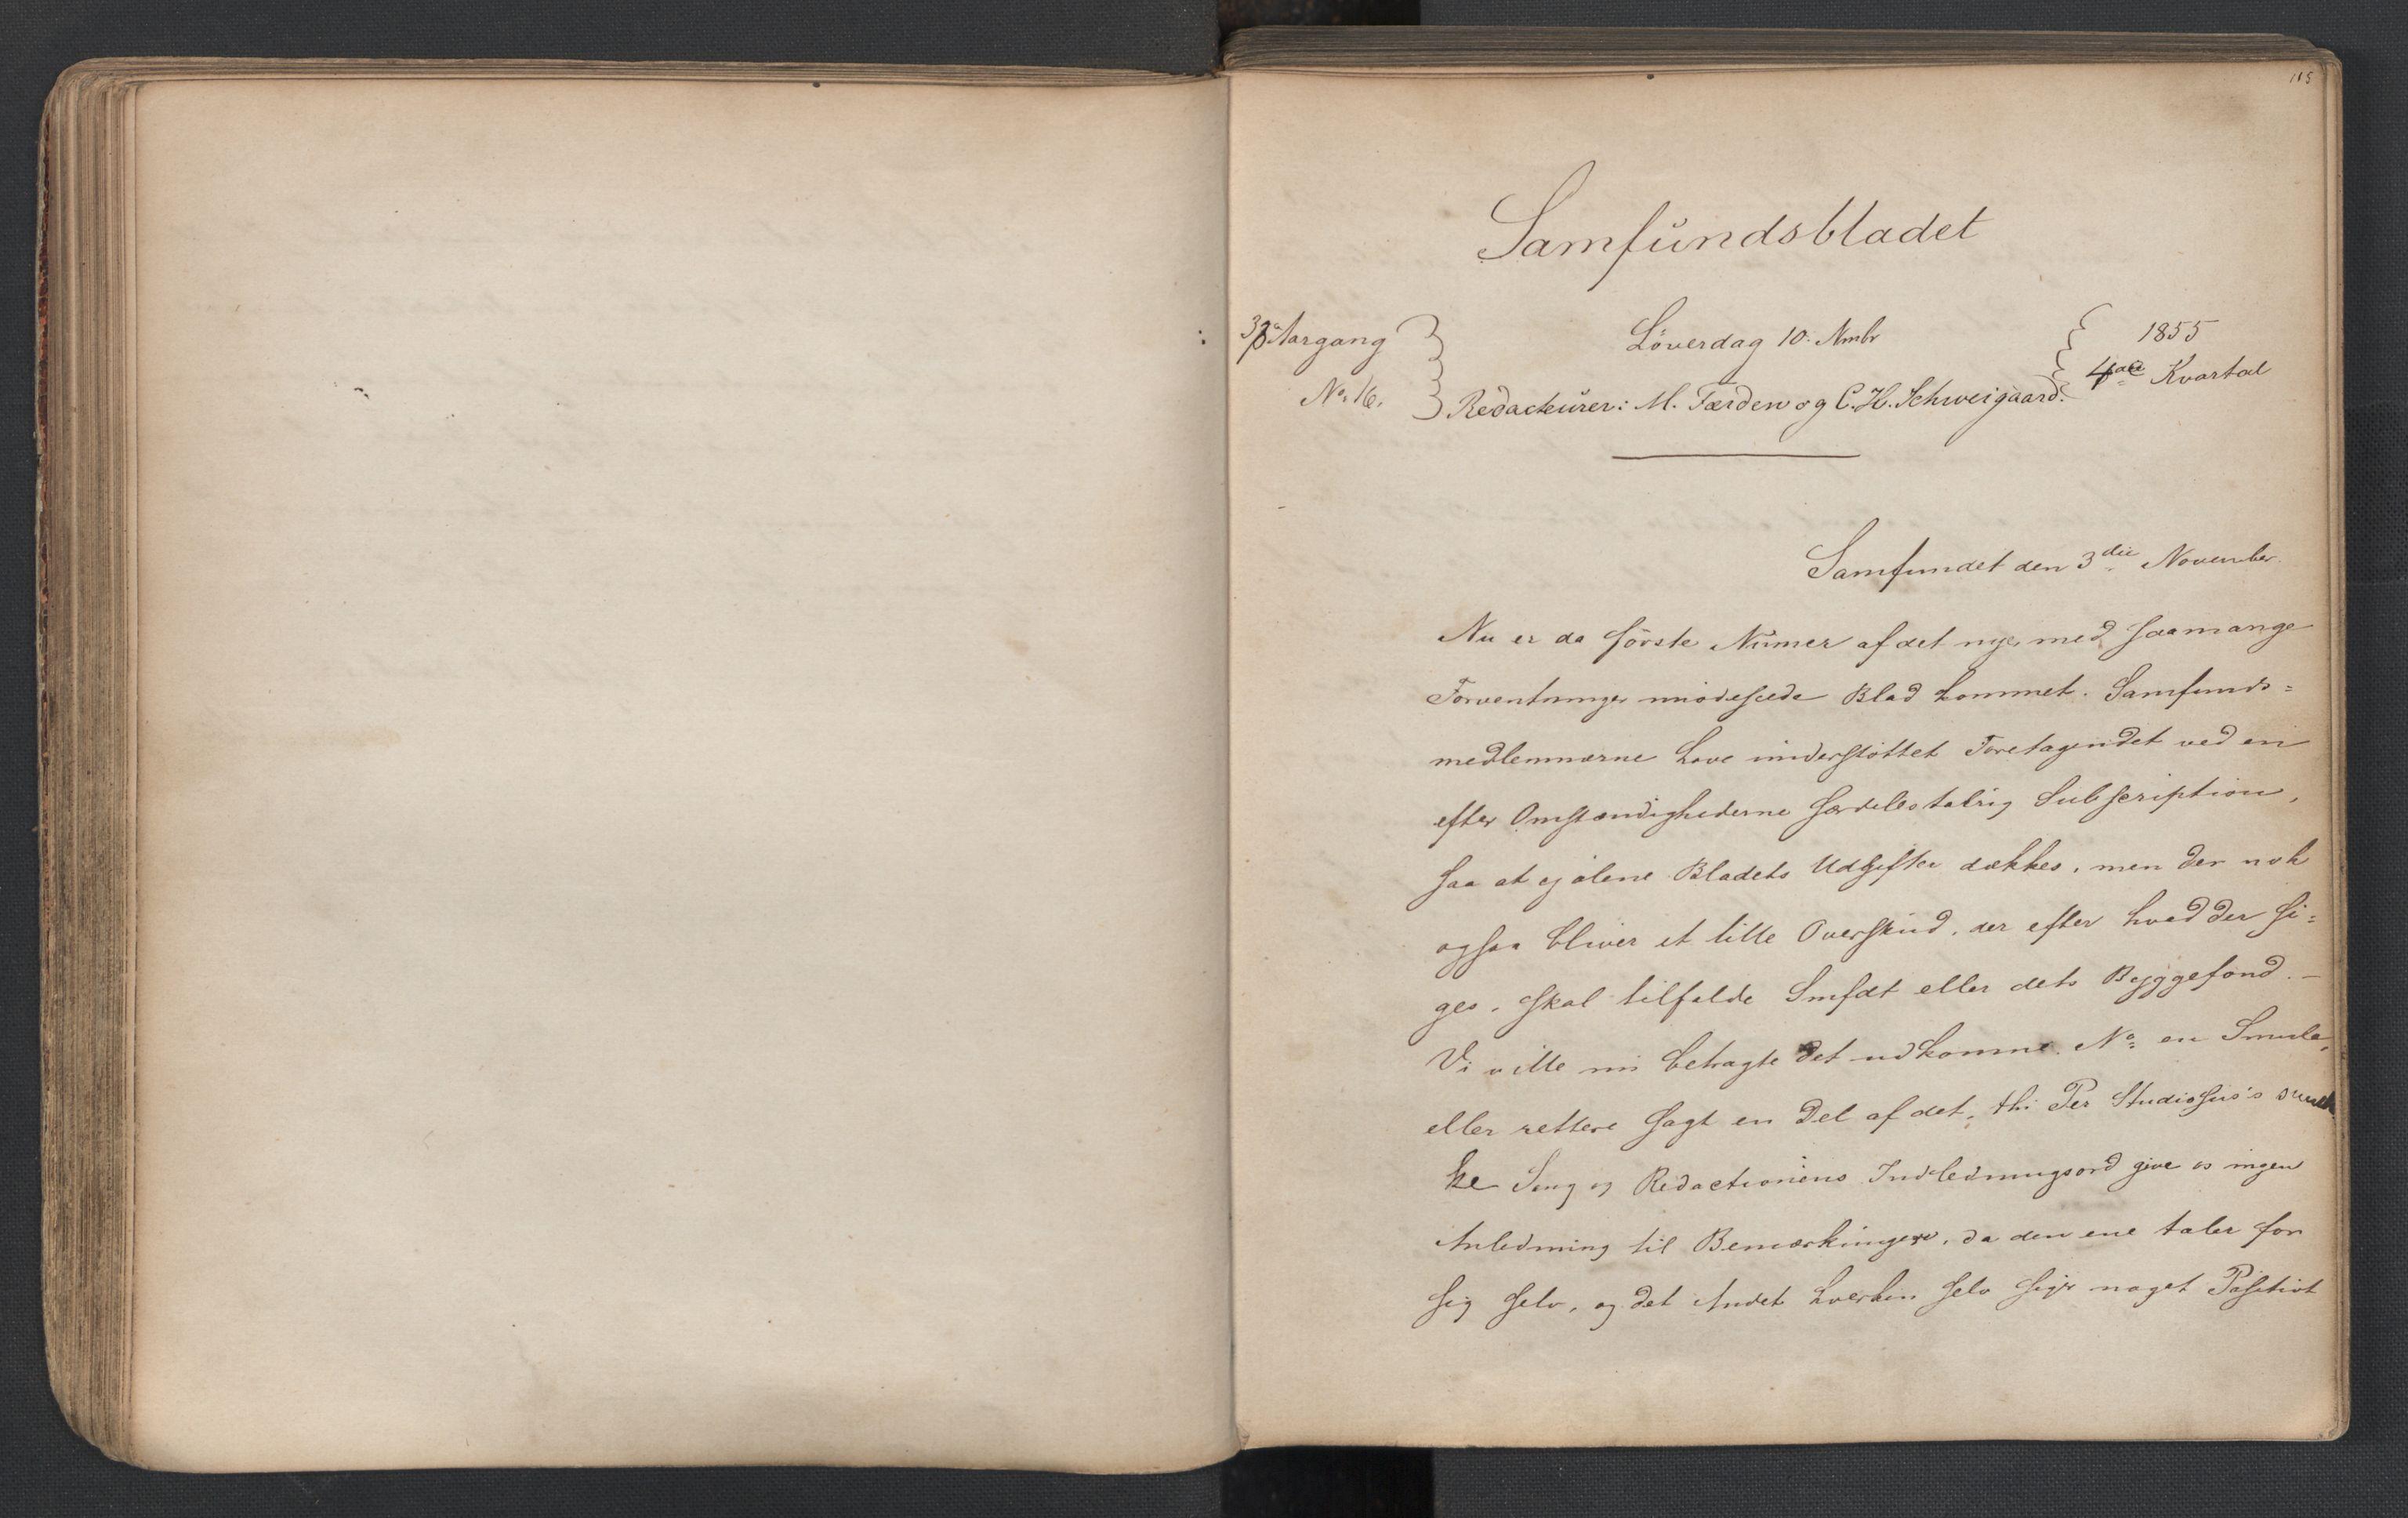 RA, Det Norske Studentersamfund, X/Xa/L0005, 1855-1856, s. 54